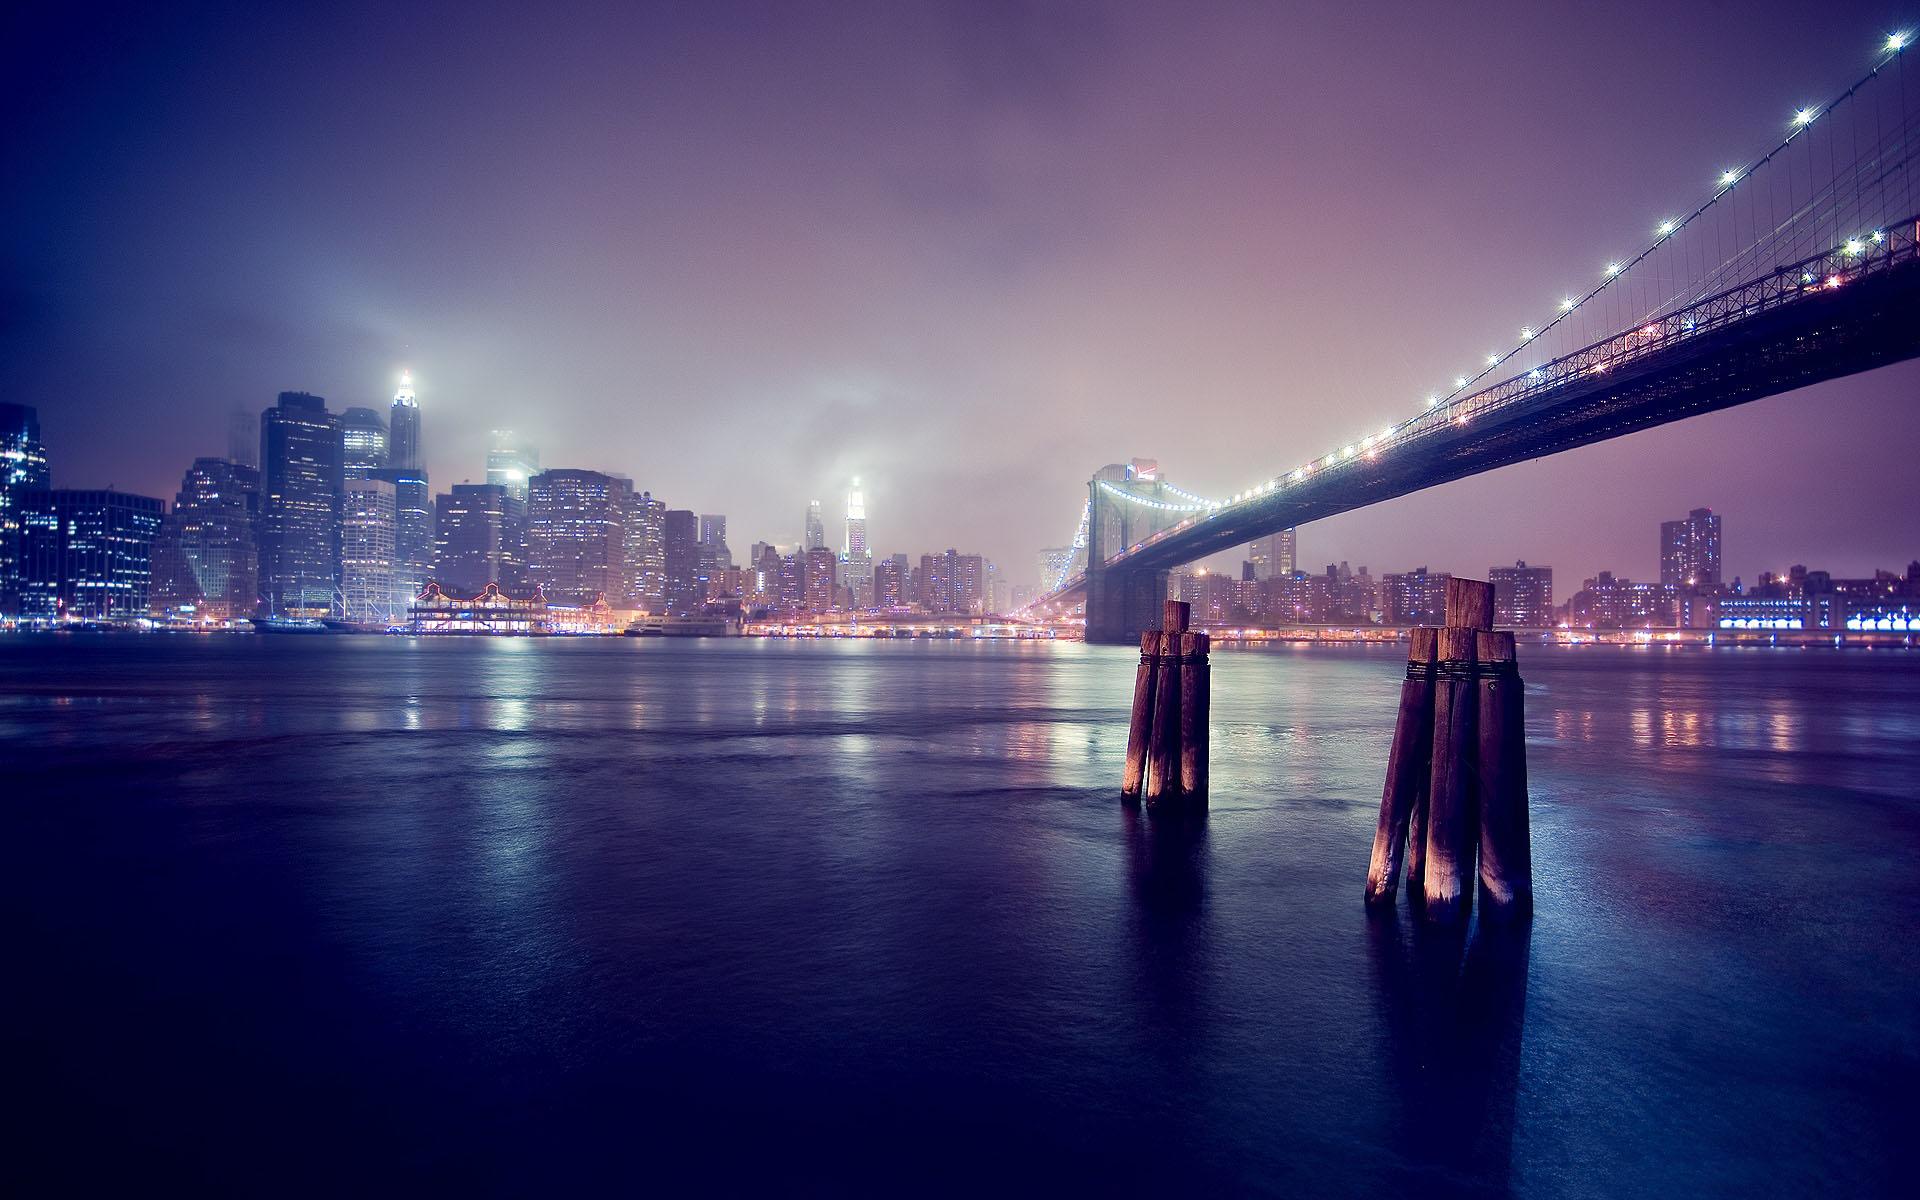 chicago bridge night skyline widescreen hd wallpapers 1920x1200